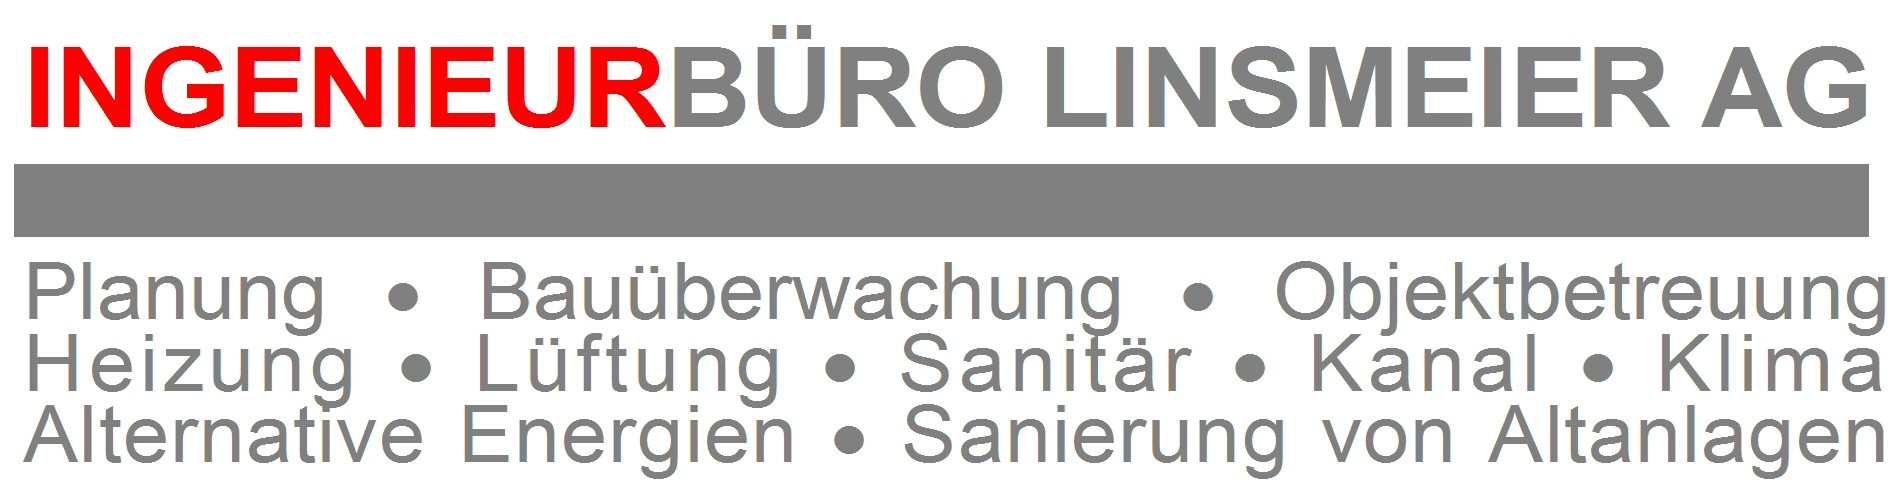 Ingenieurbüro Linsmeier AG